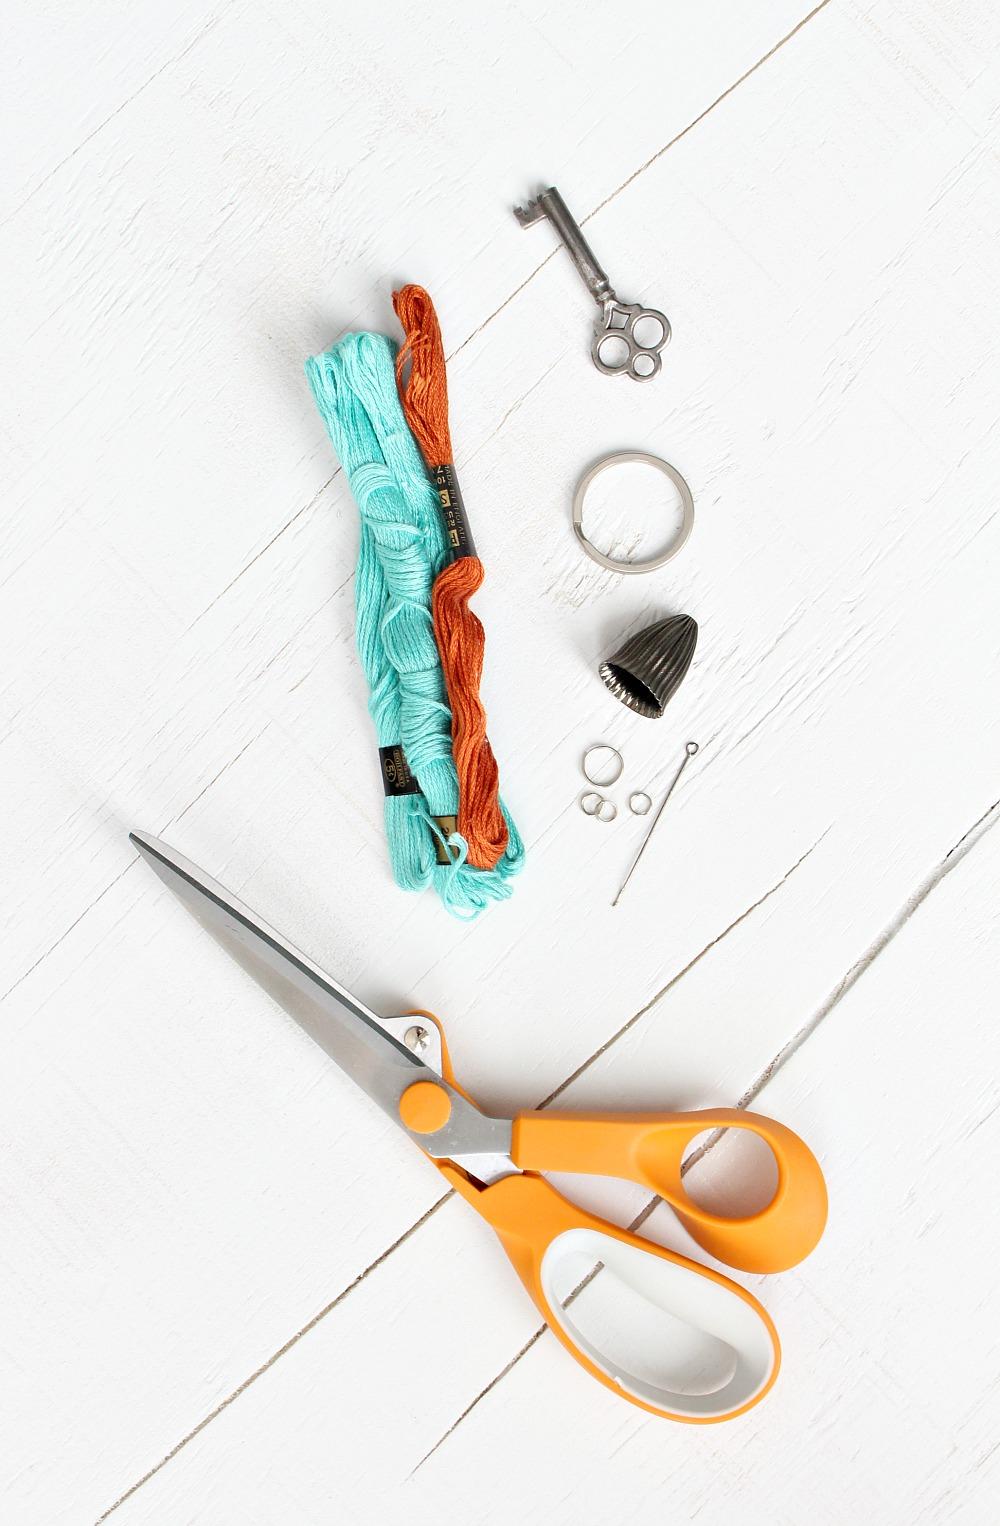 DIY Tassel Tutorial with Supply List